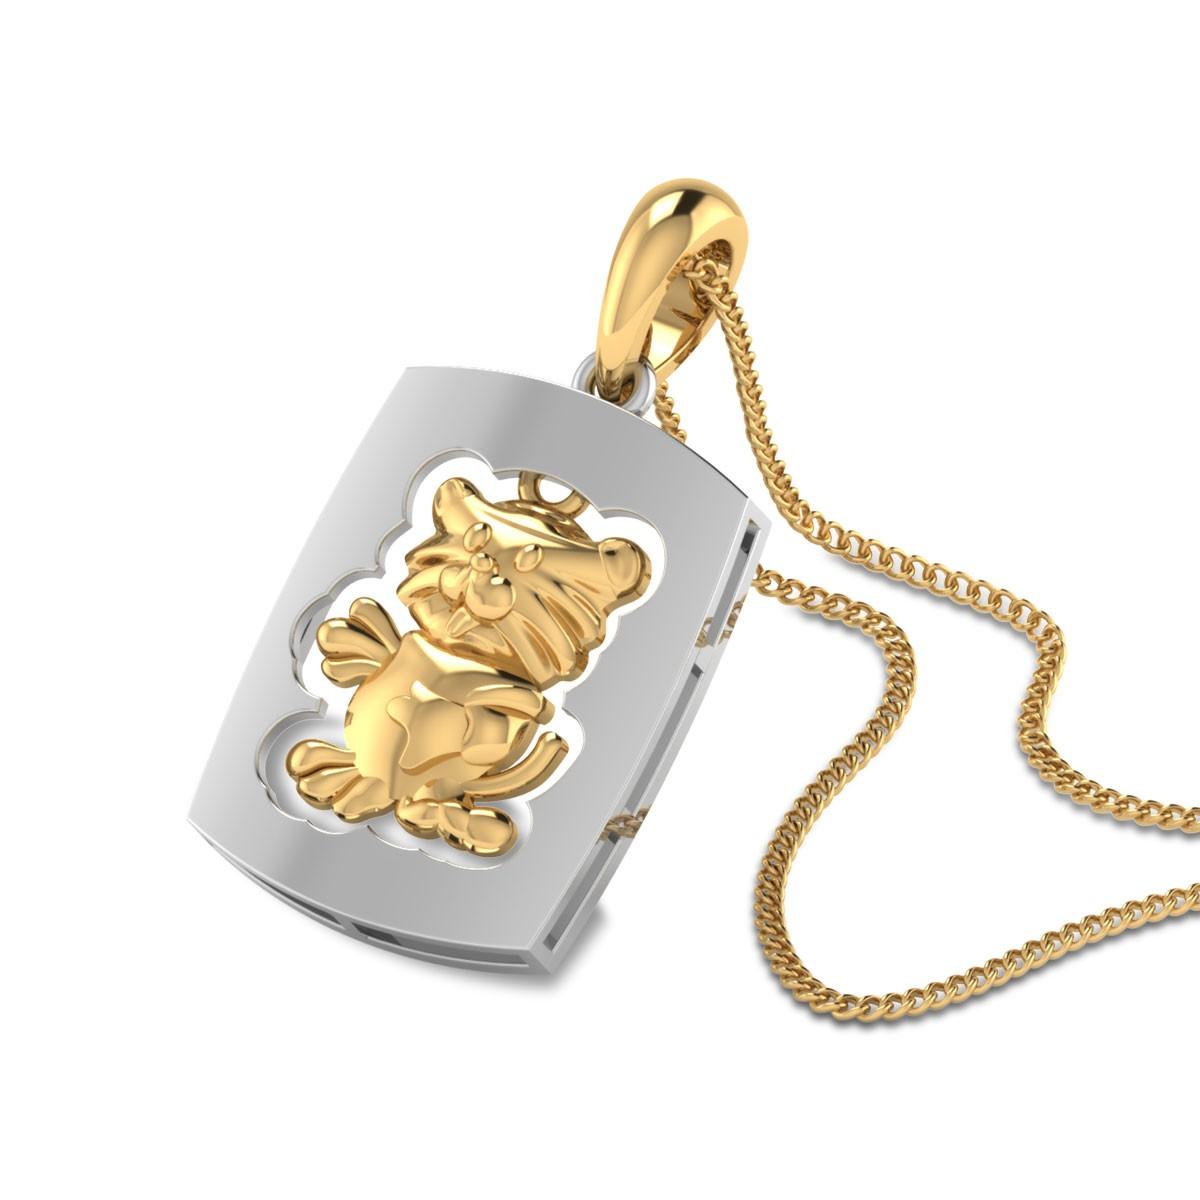 Quentessa Gold Dog Tag Pendant